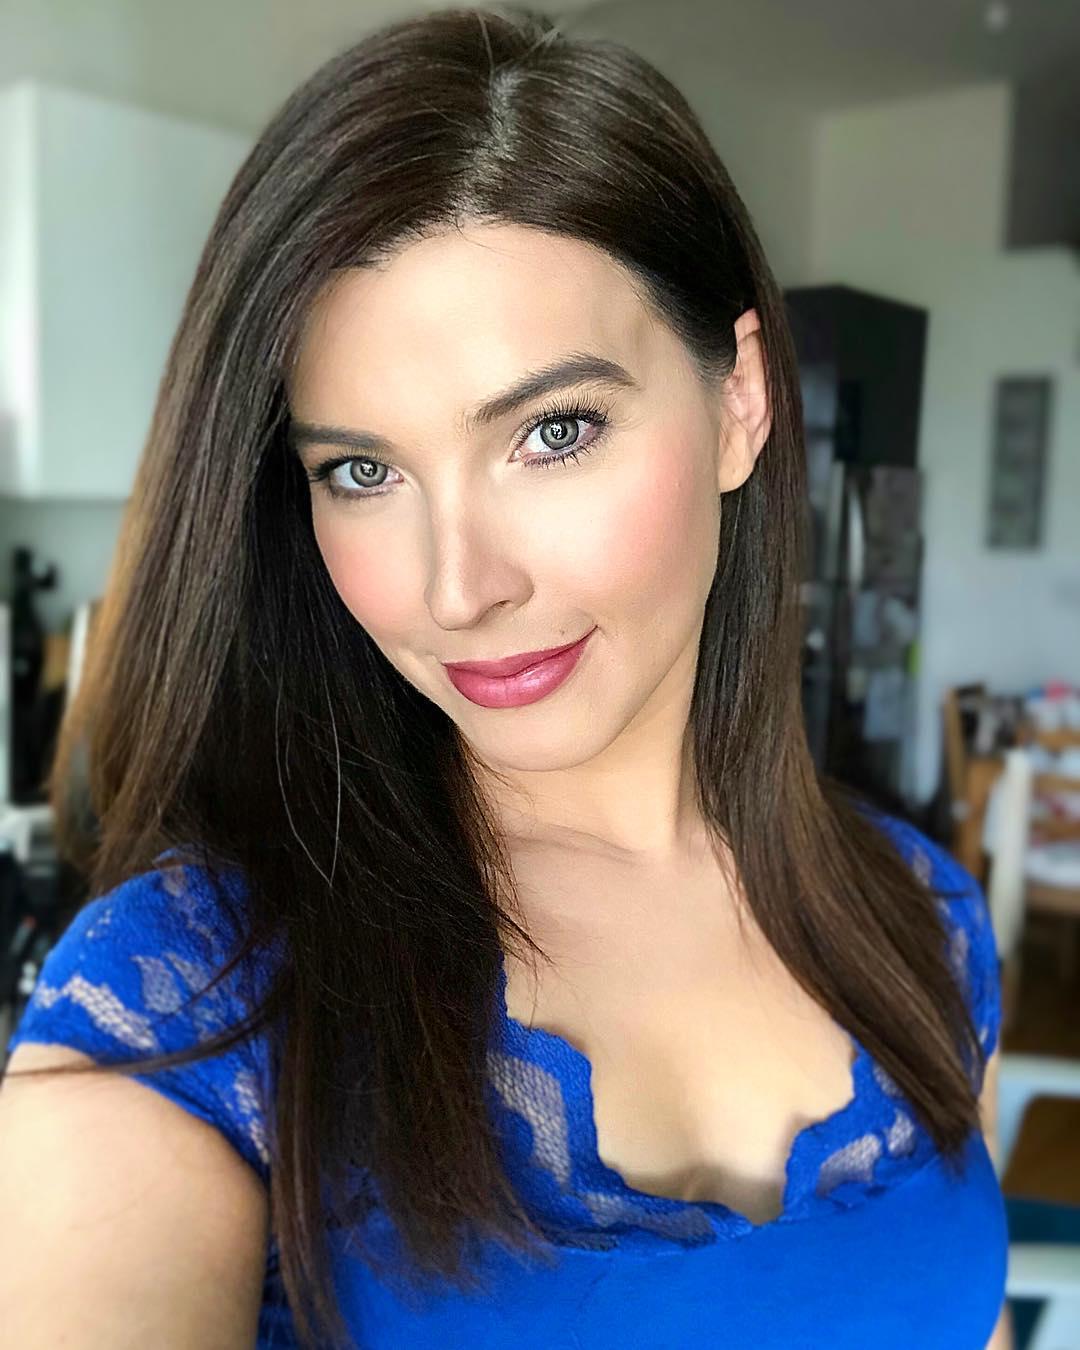 Carolina Gutierrez - Most Face Beauty Transgender Women